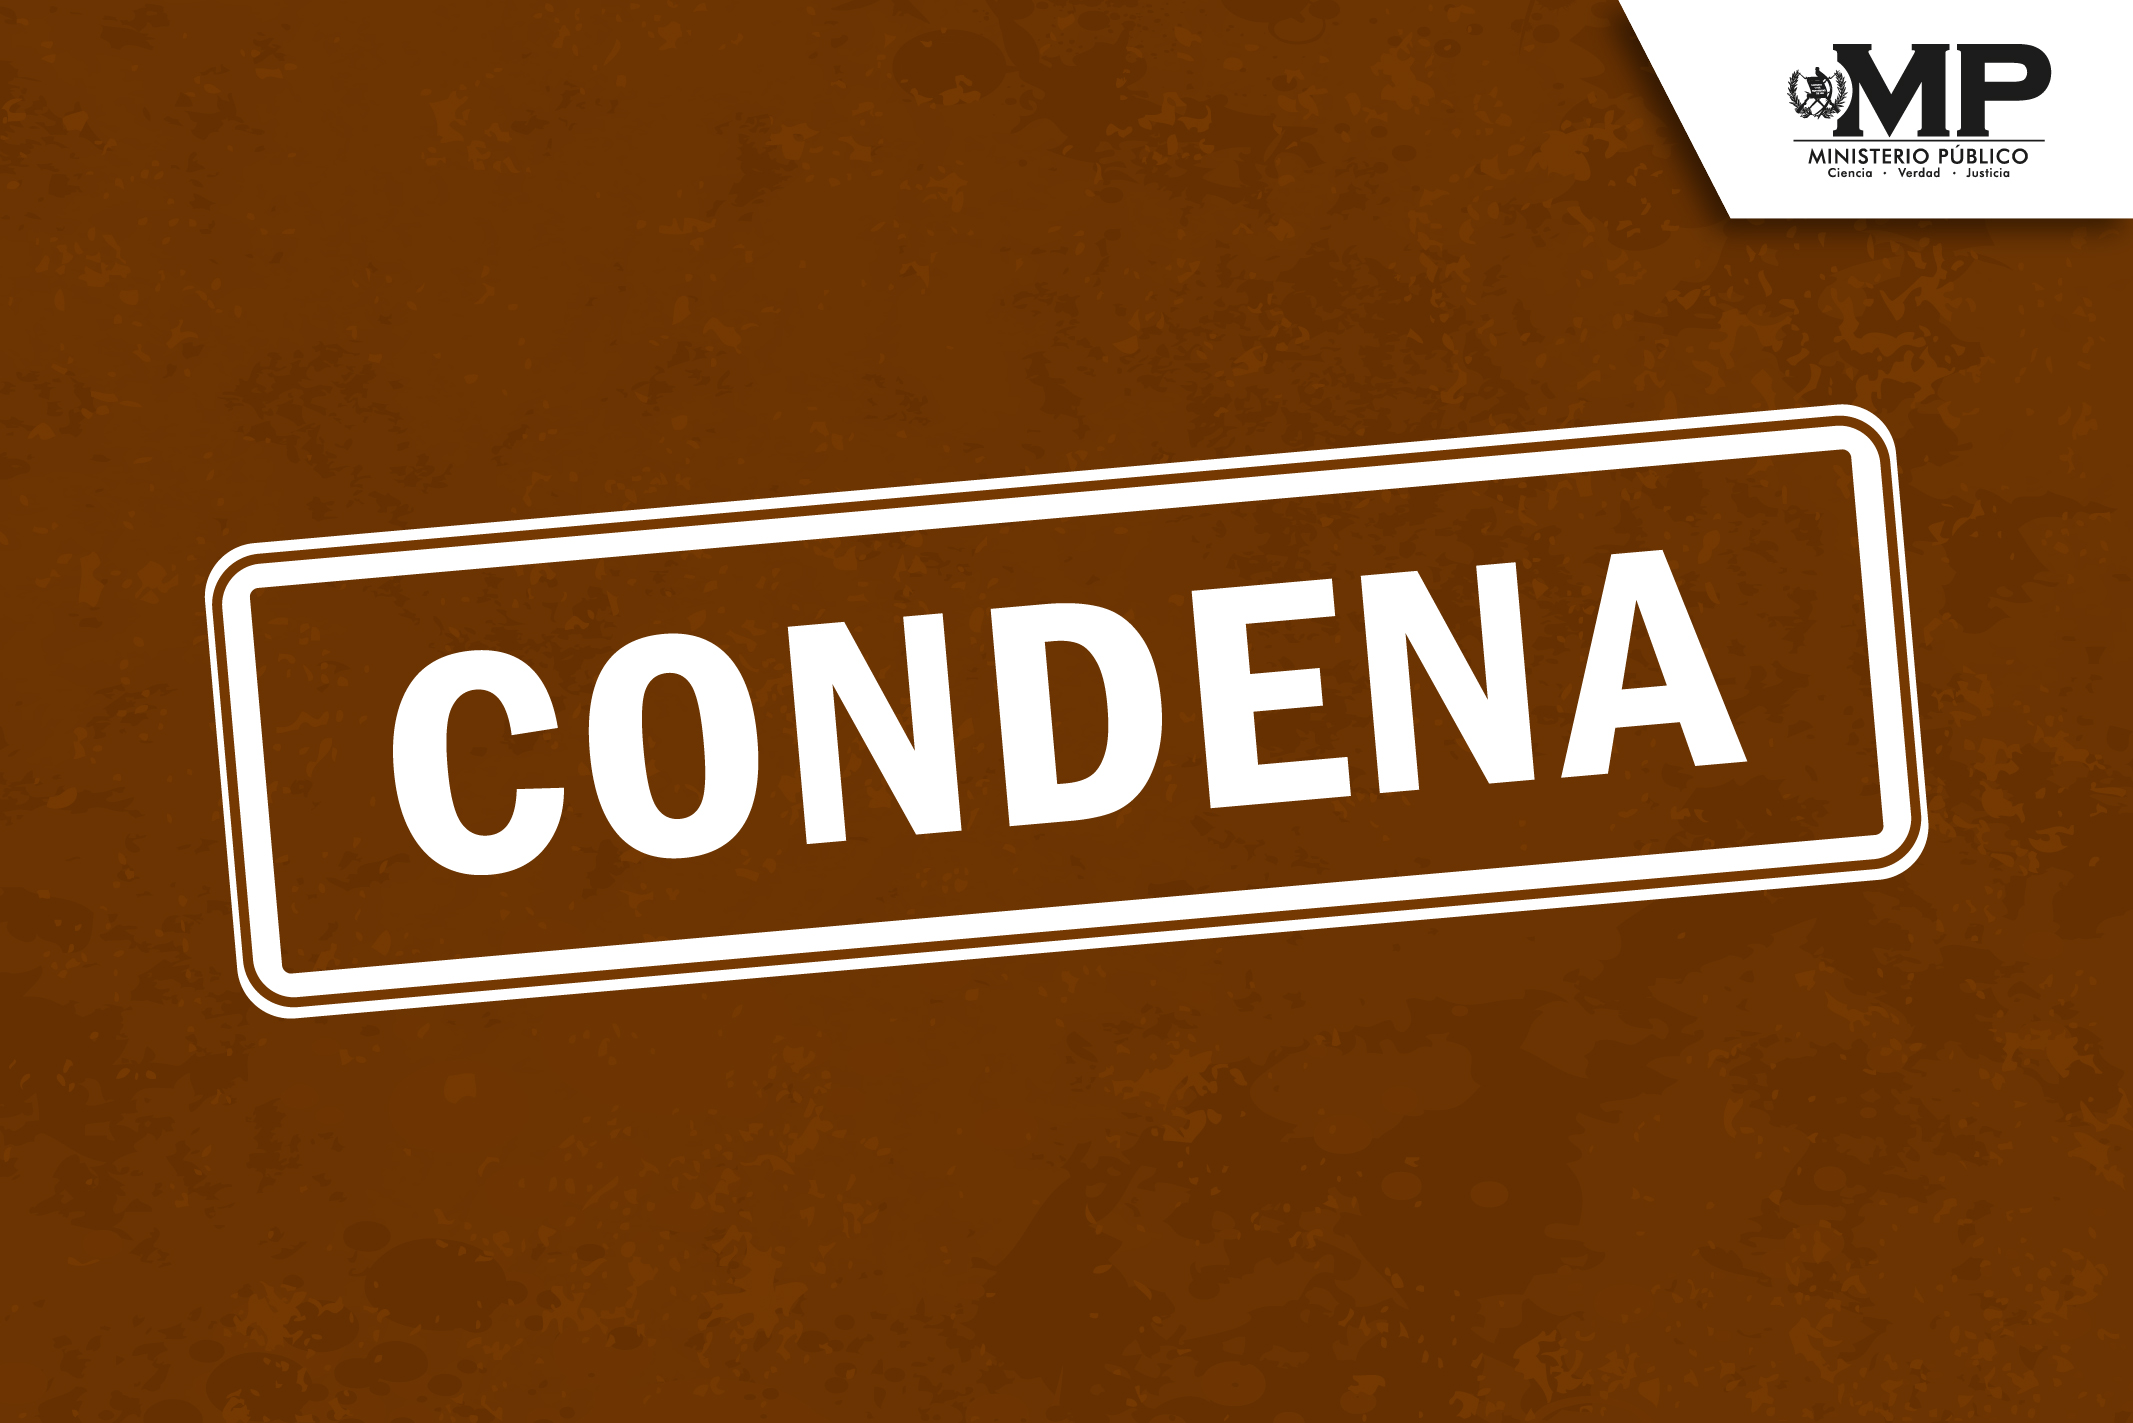 5 BACK_MP_CONDENA-03